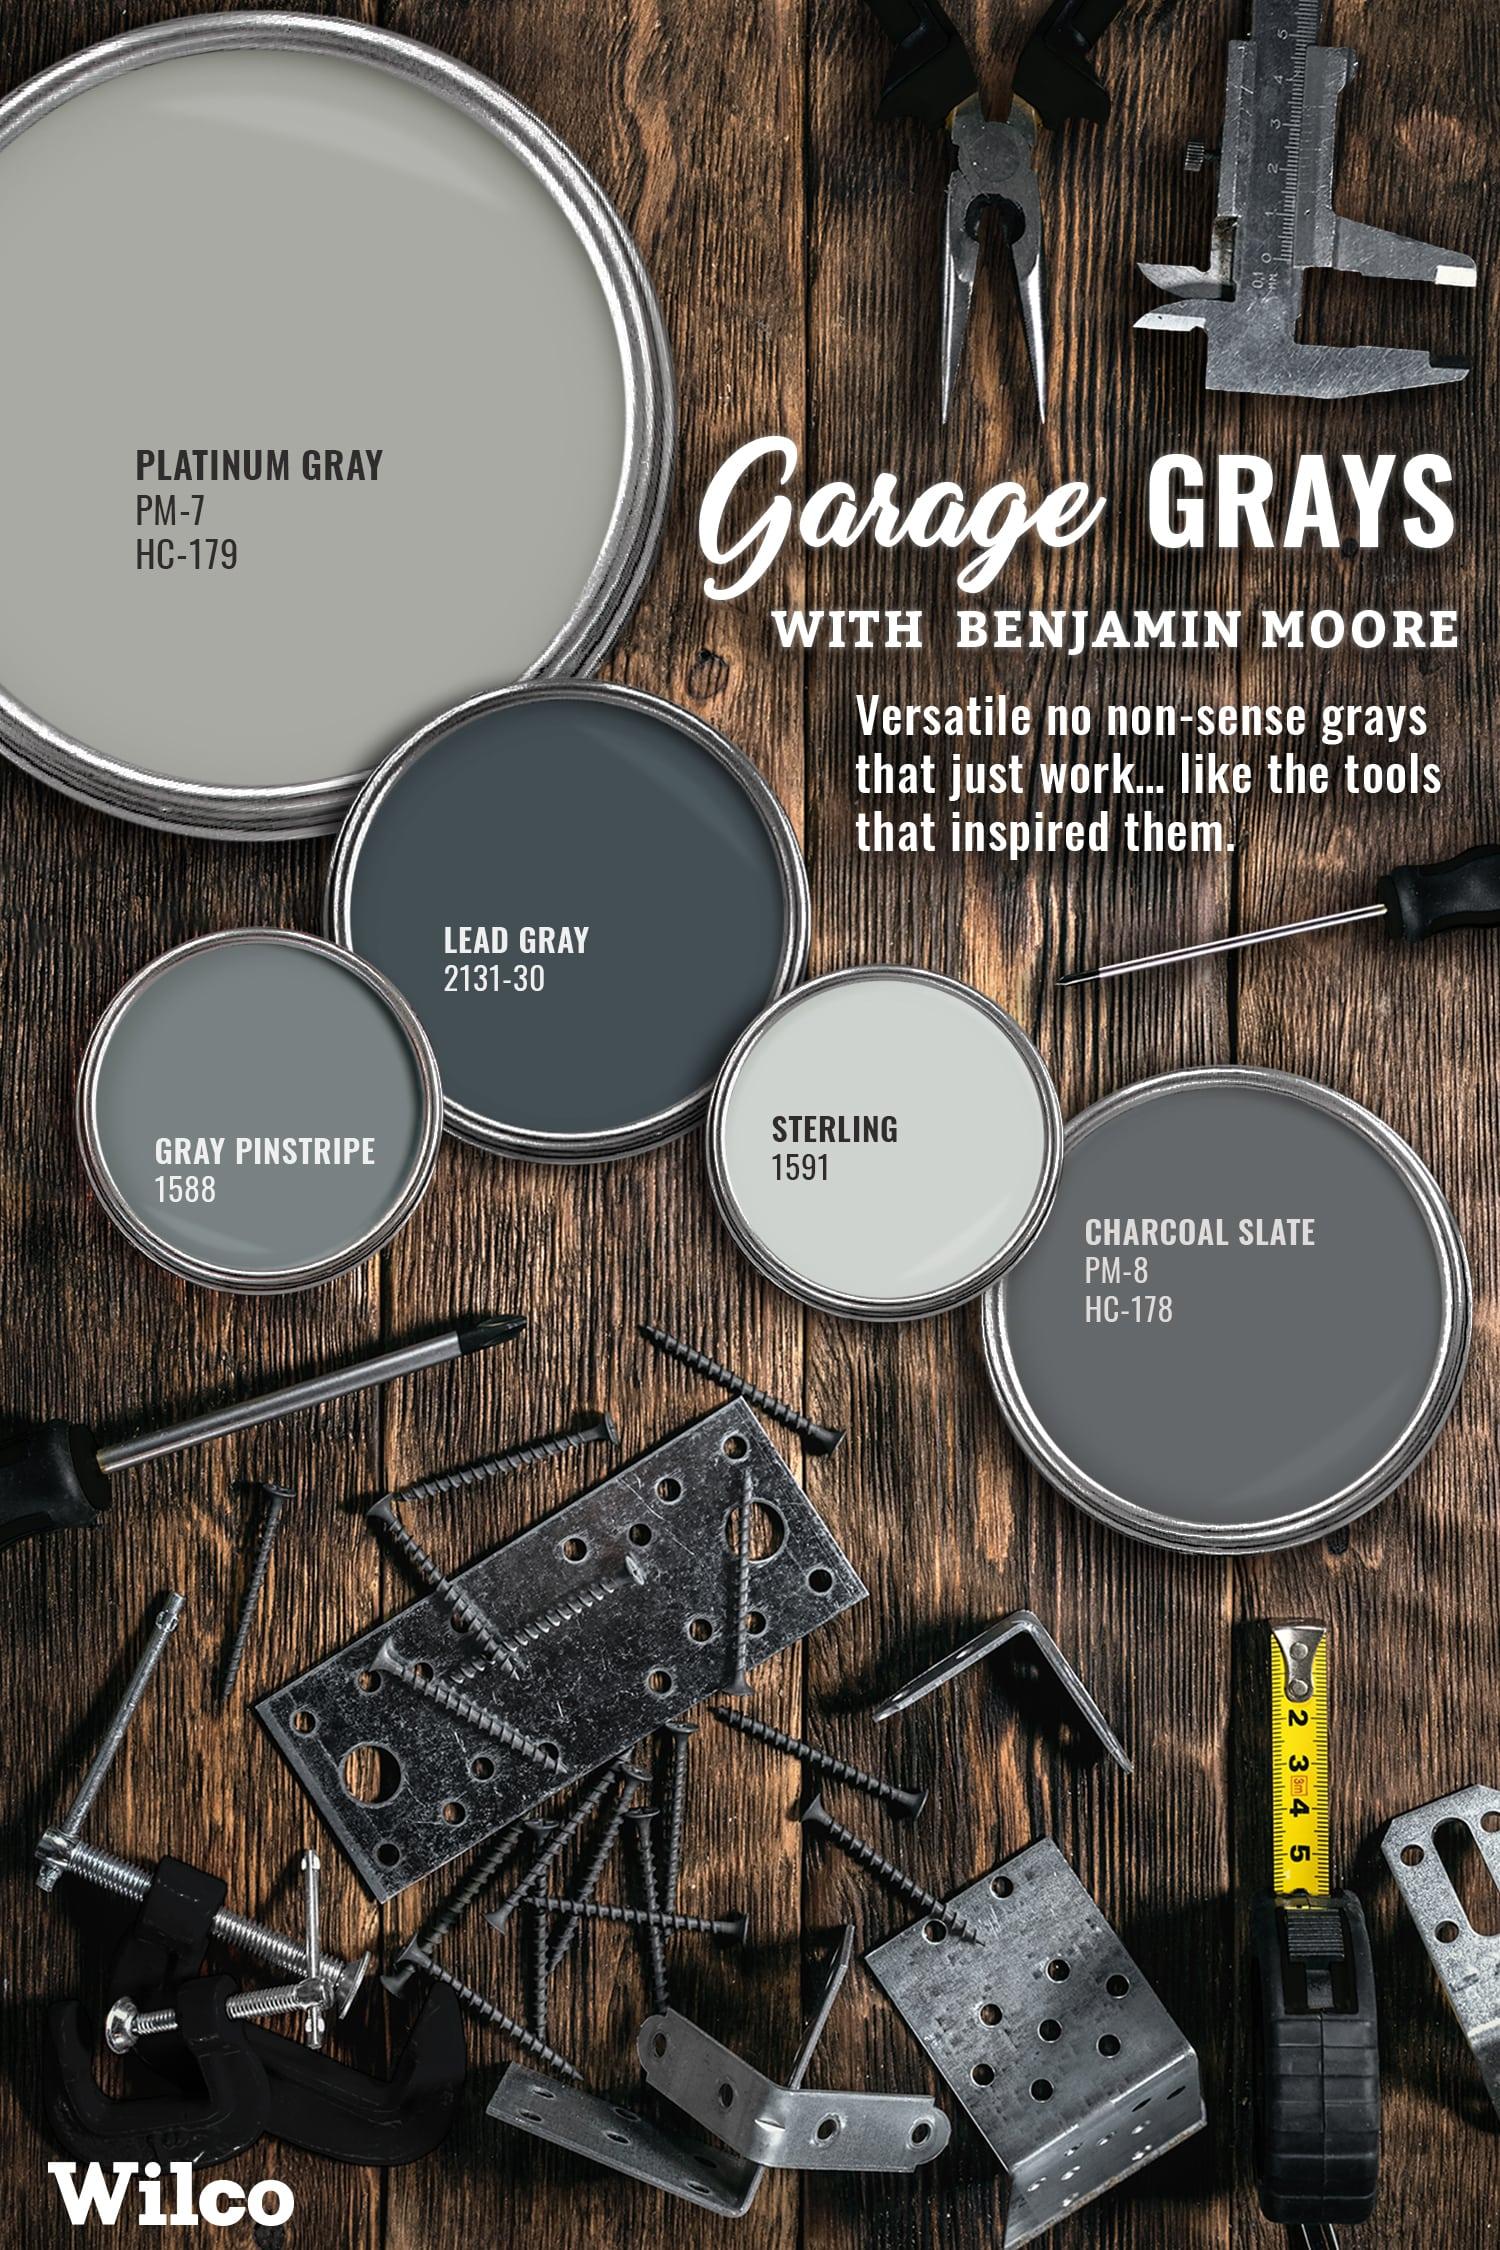 Ben Moore Garage Grays Paint Palette